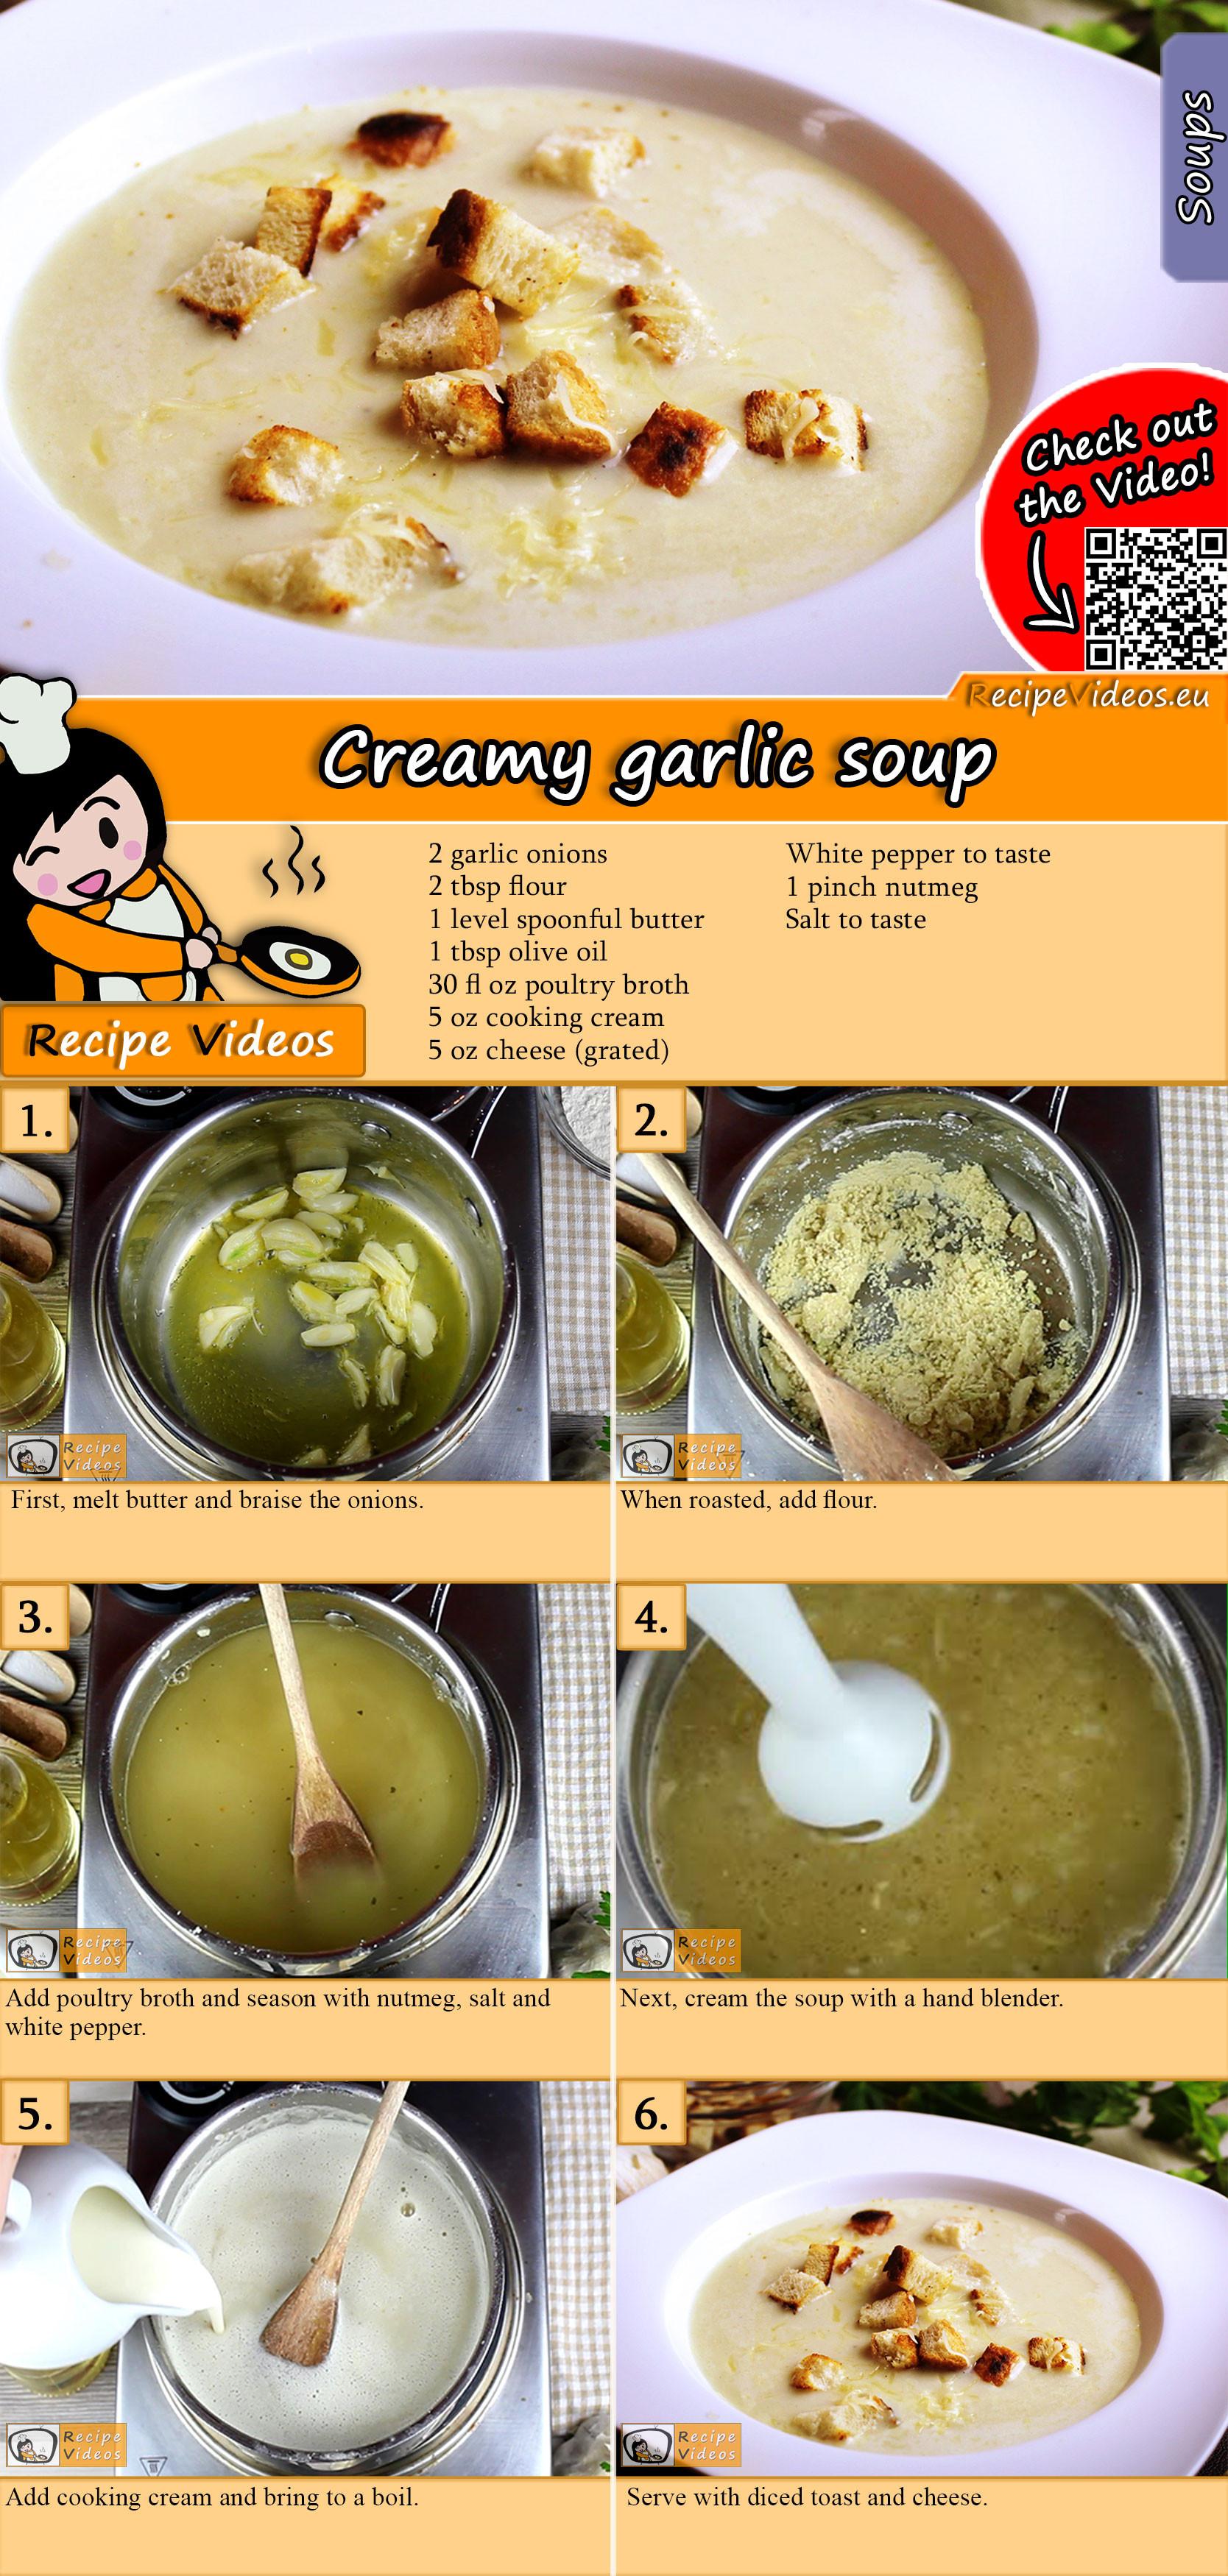 Creamy garlic soup recipe with video